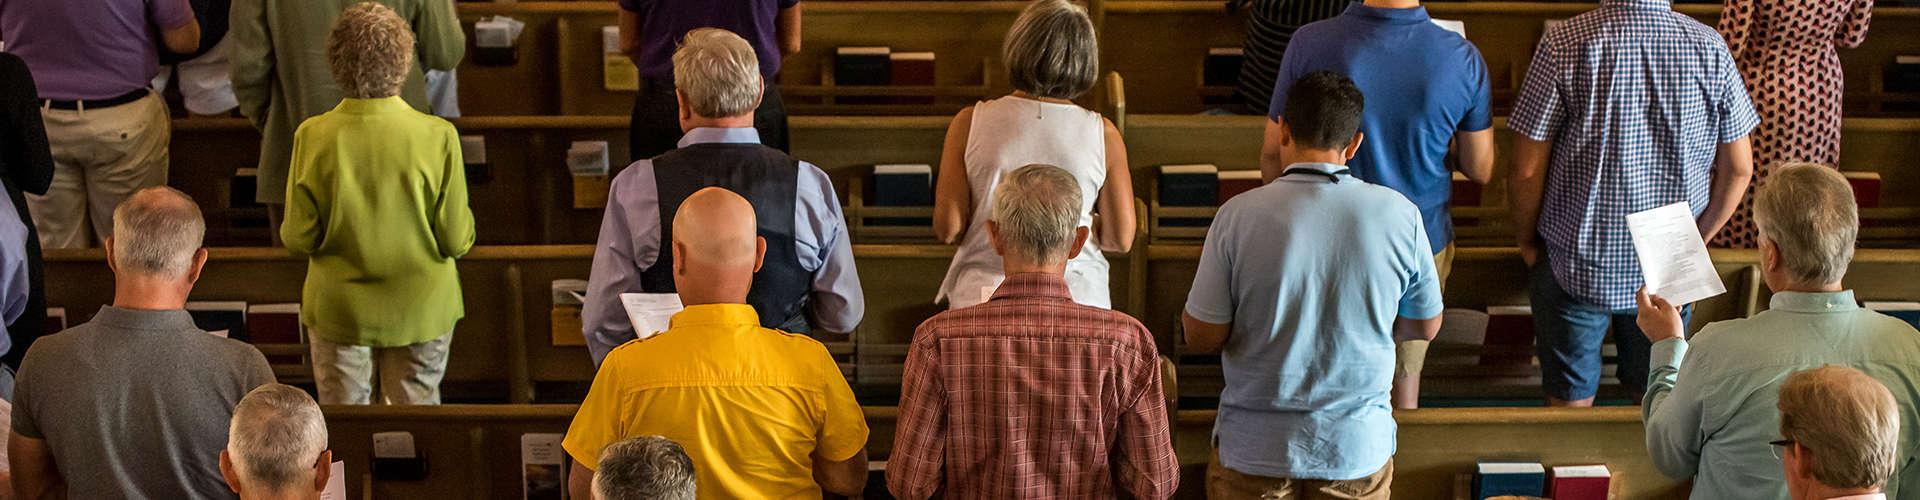 people in church pews